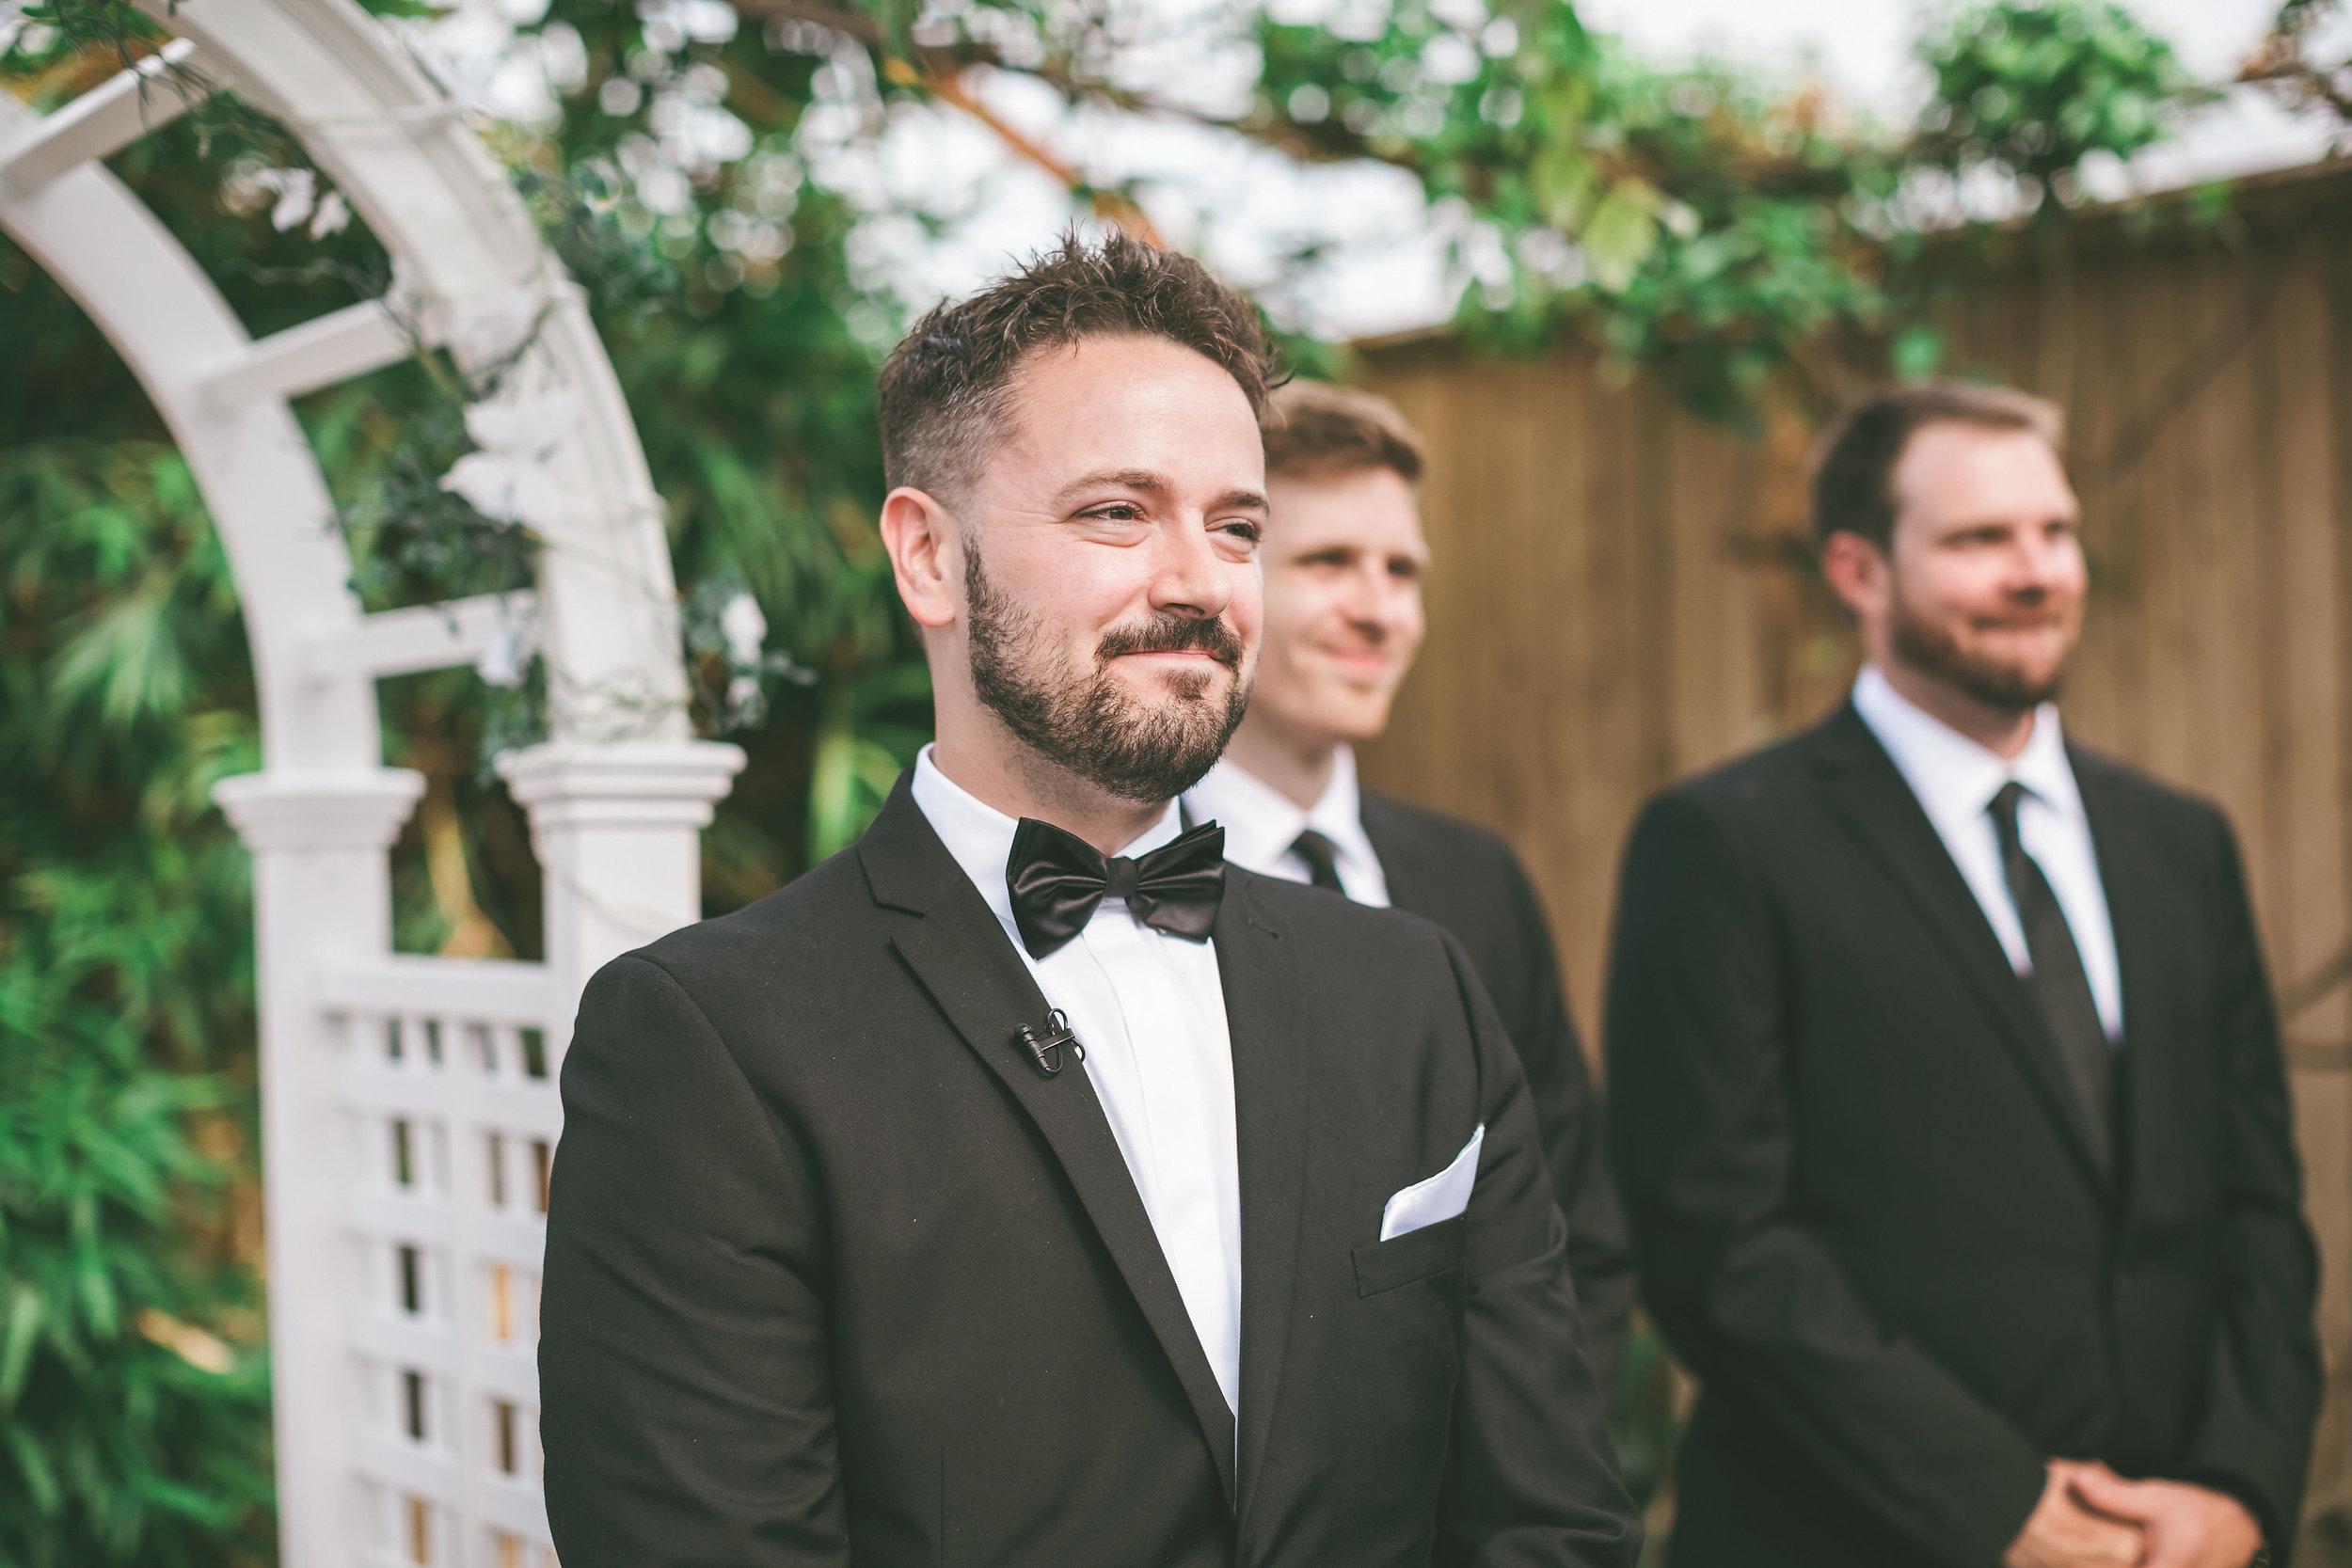 gosia___mike_wedding___lifesreel_danielcaruso___0624.jpg